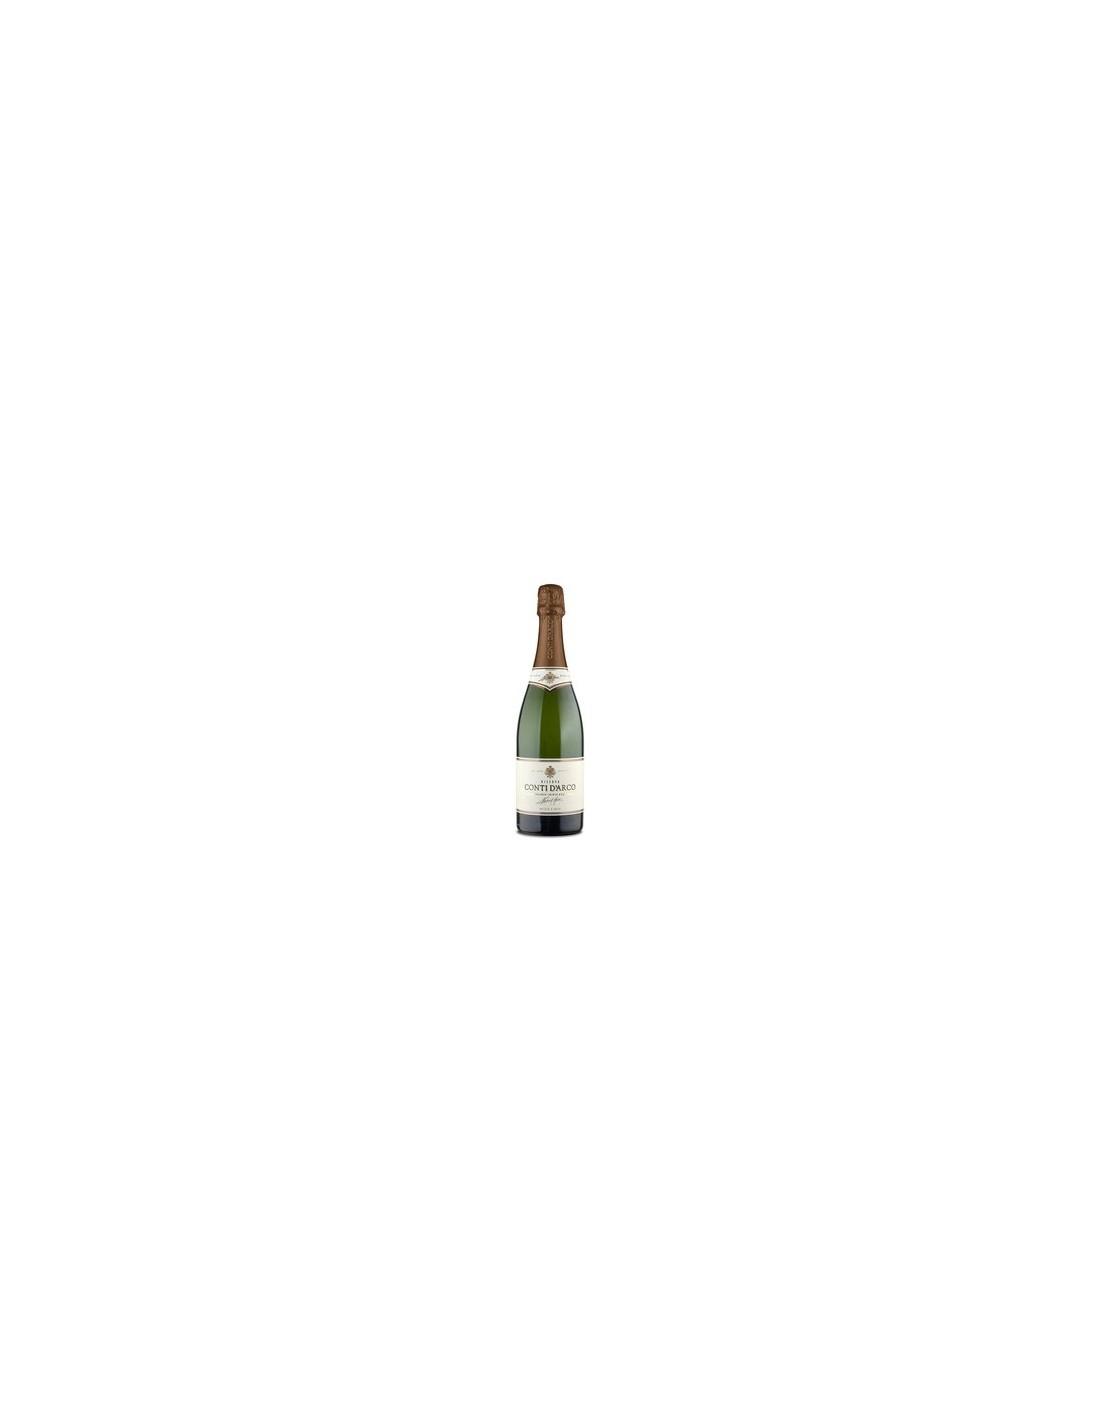 Vin spumant alb, Chardonnay-Pinot Noir, Conti d'Arco Trentino, 0.75L, 12.5% alc., Italia